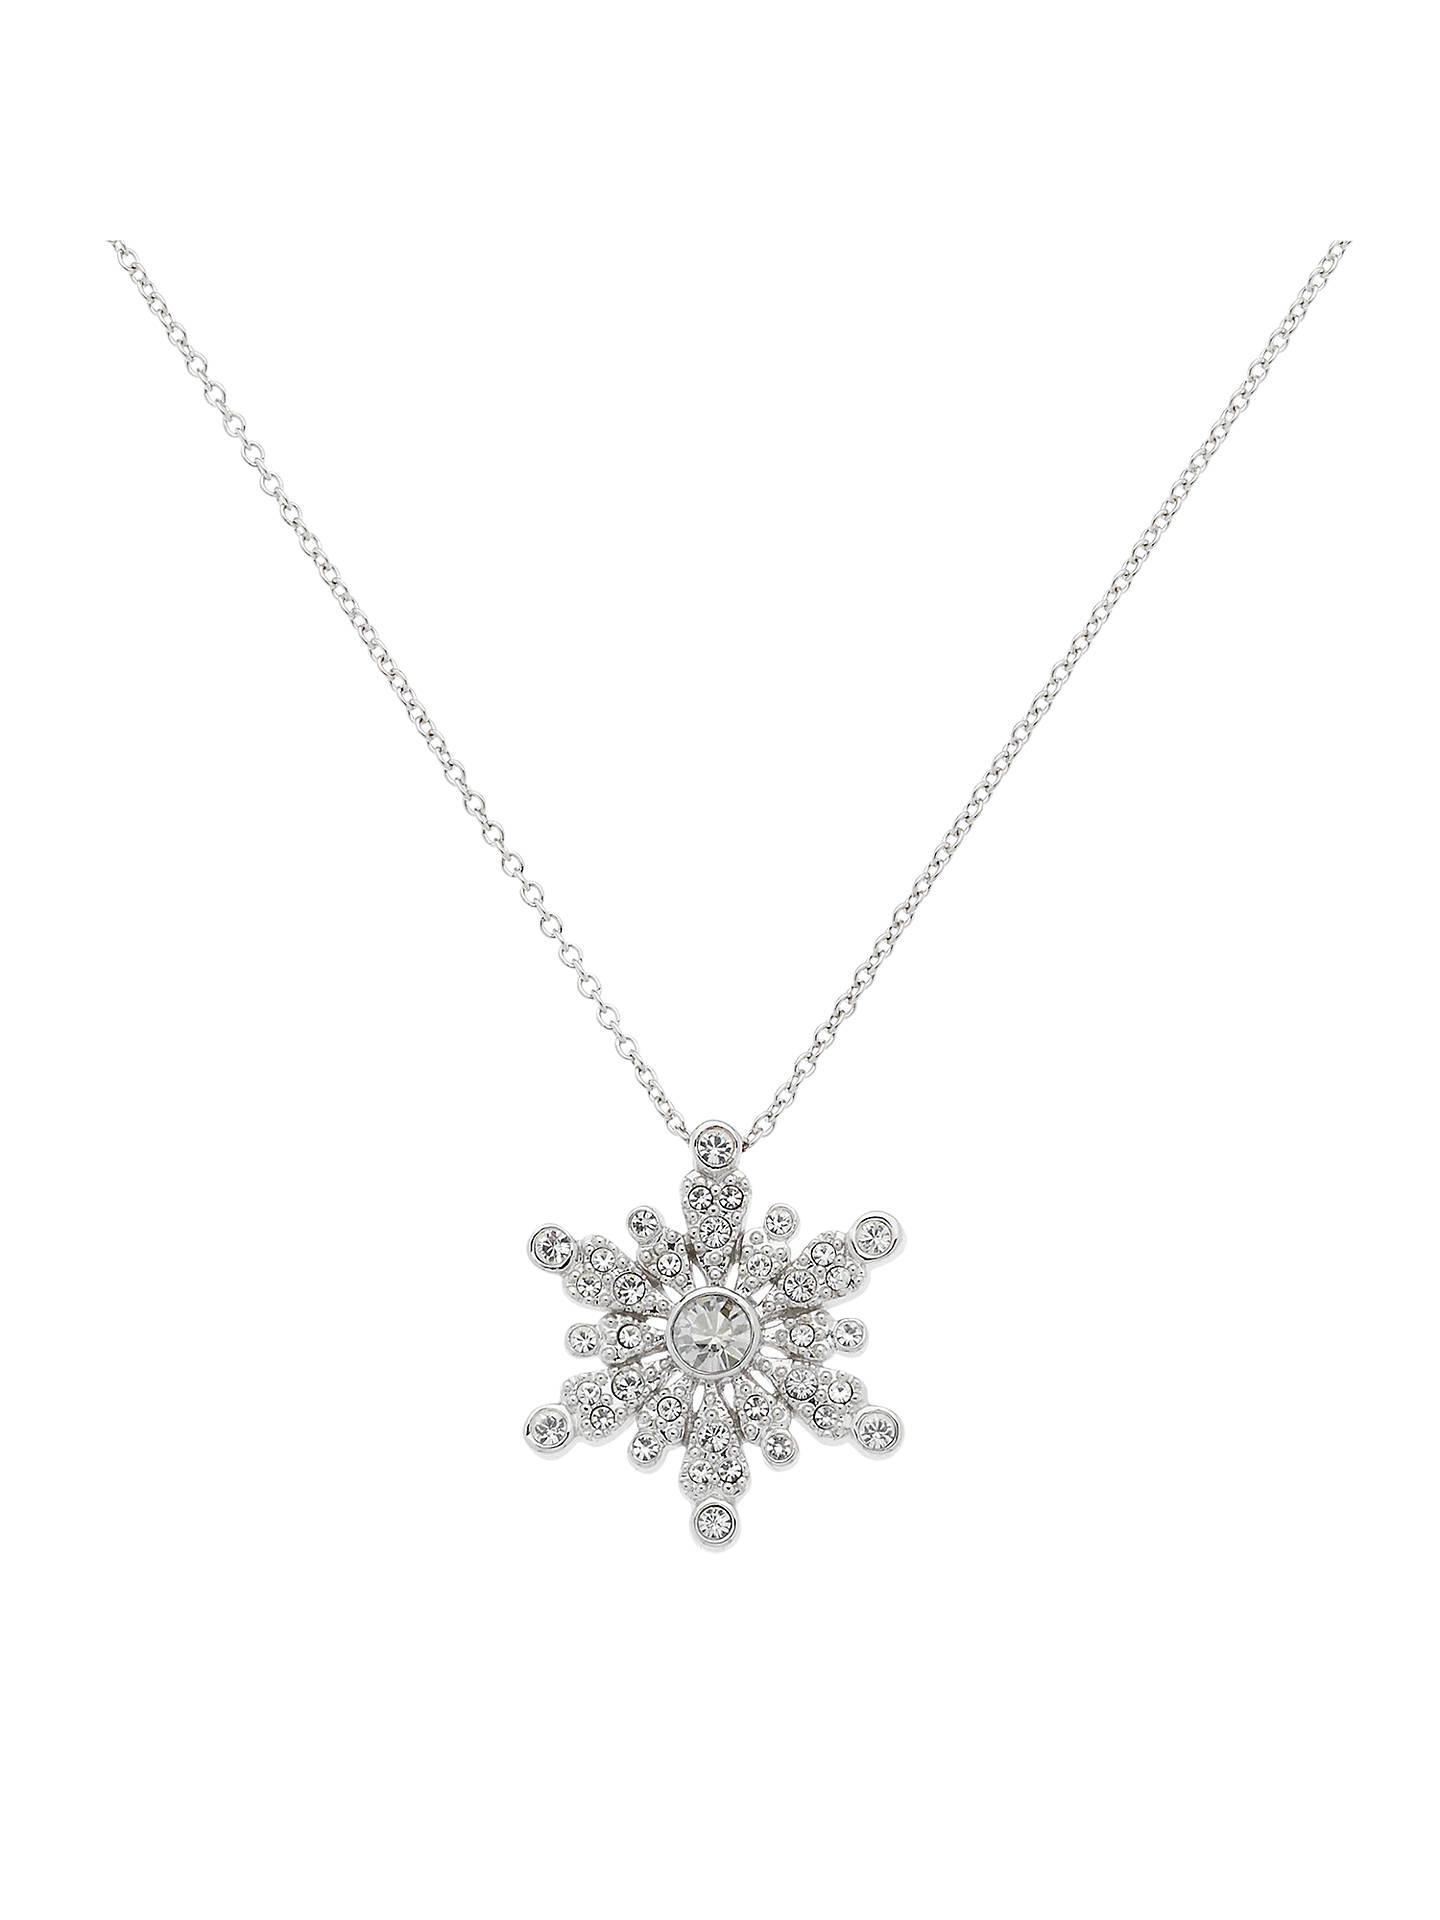 e089ee0c64 Buy Cachet London Snowflake Swarovski Crystal Pendant Necklace Online at  johnlewis.com